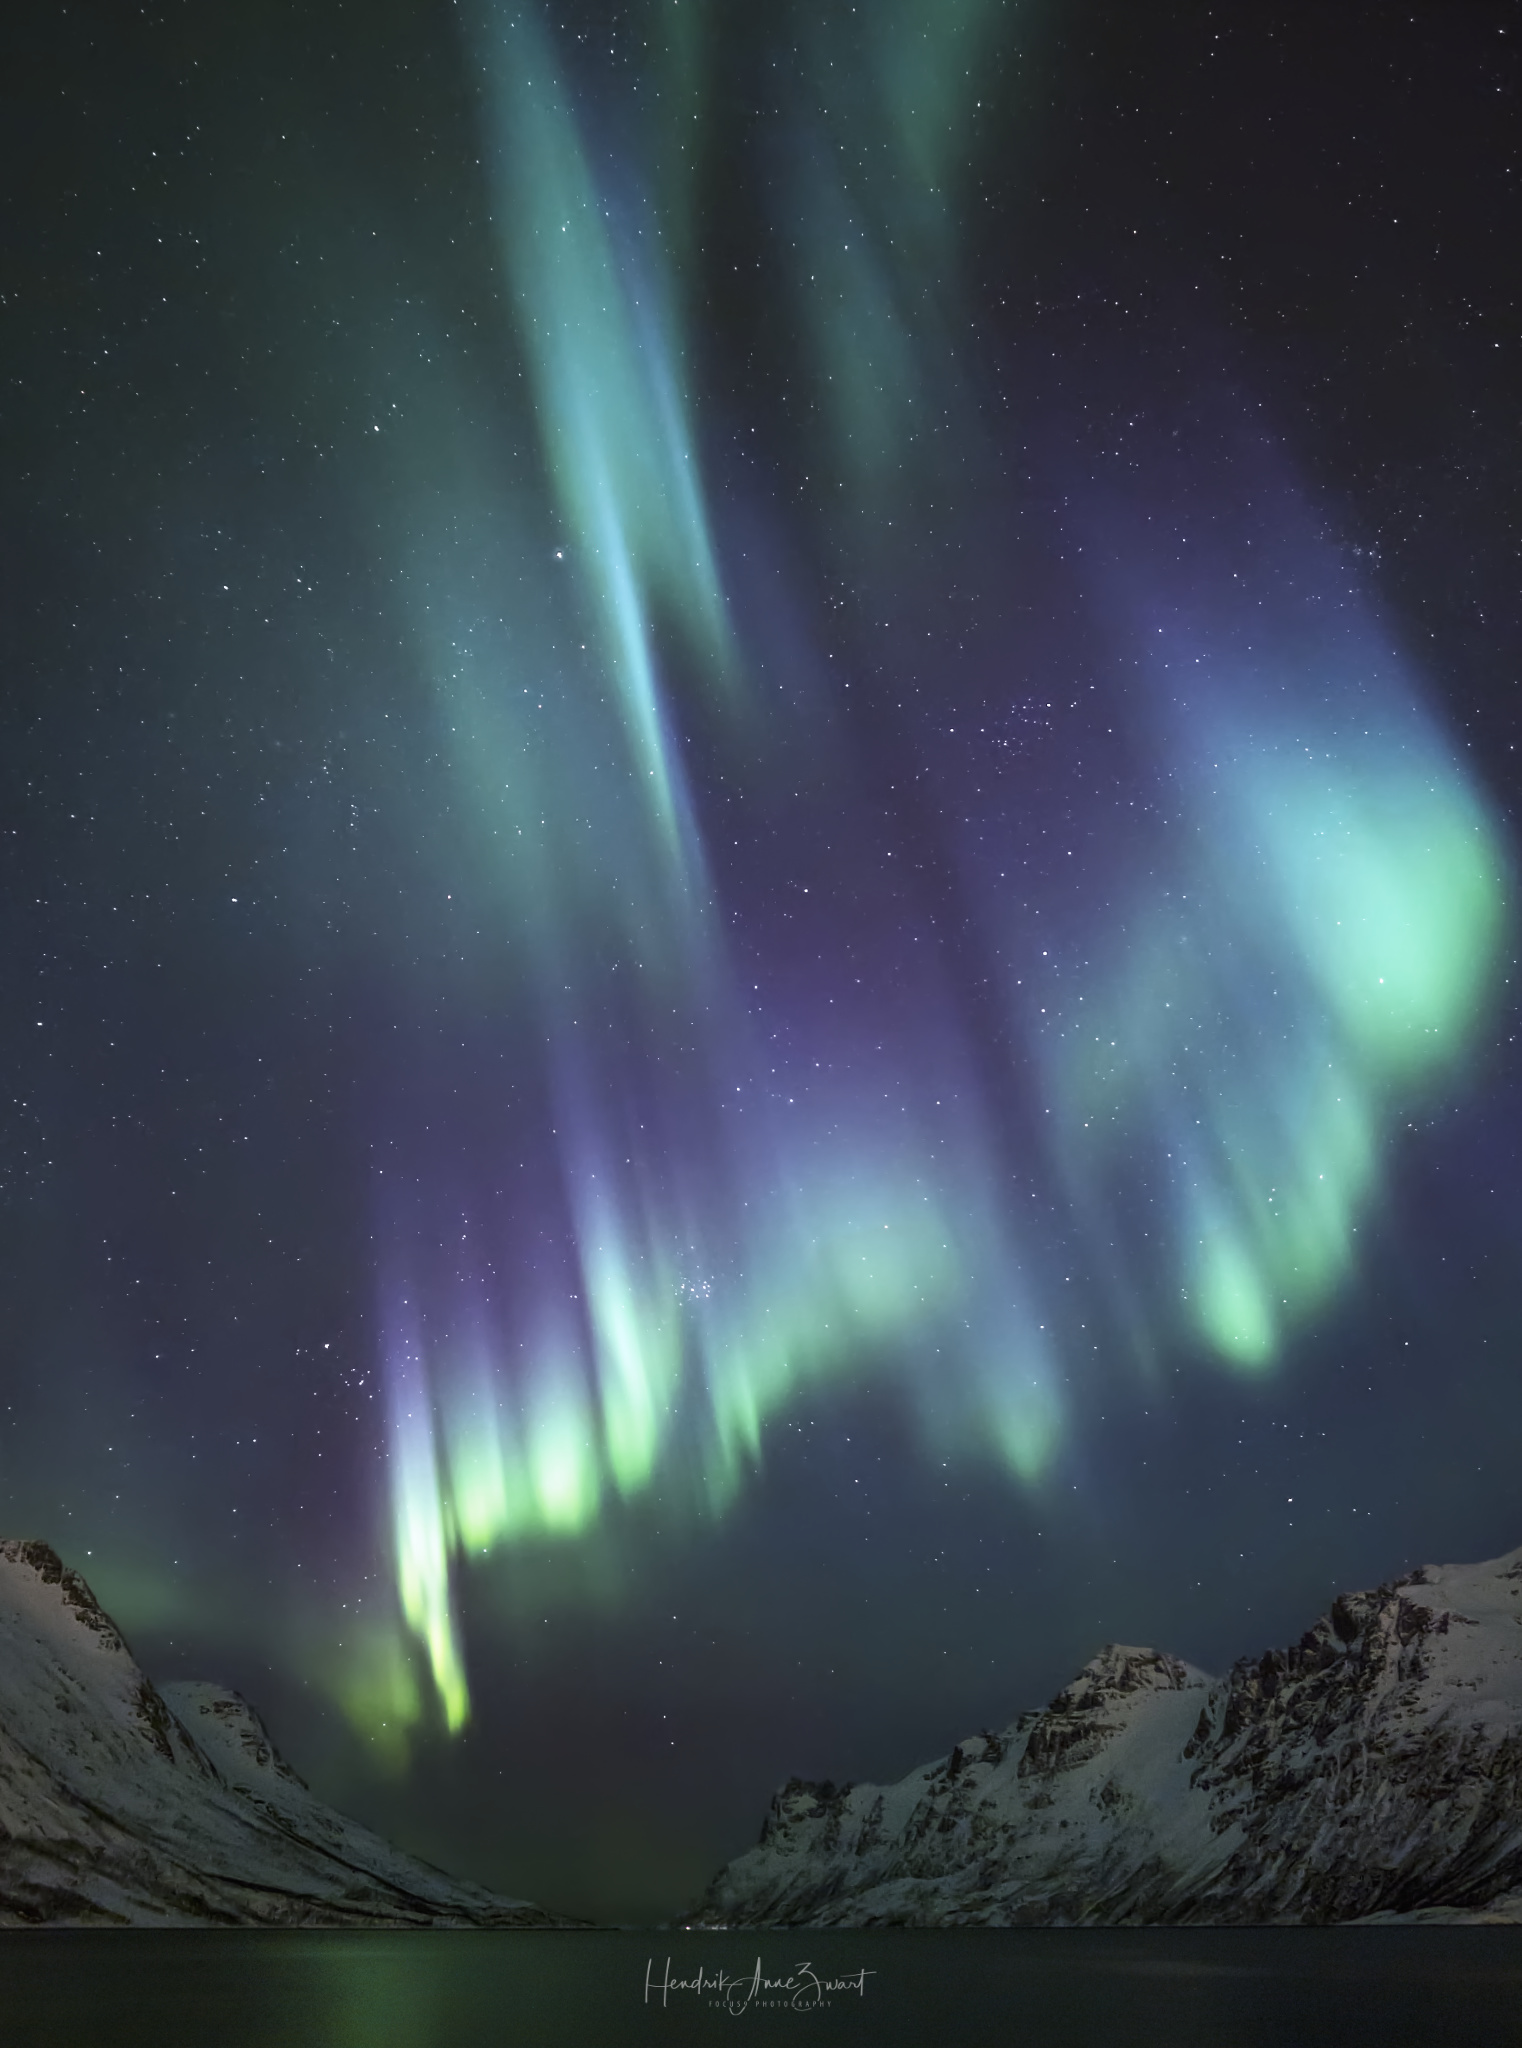 Nordic_Light_Northern_Lights_Ersfjordbotn_7_1_!Norway.jpg